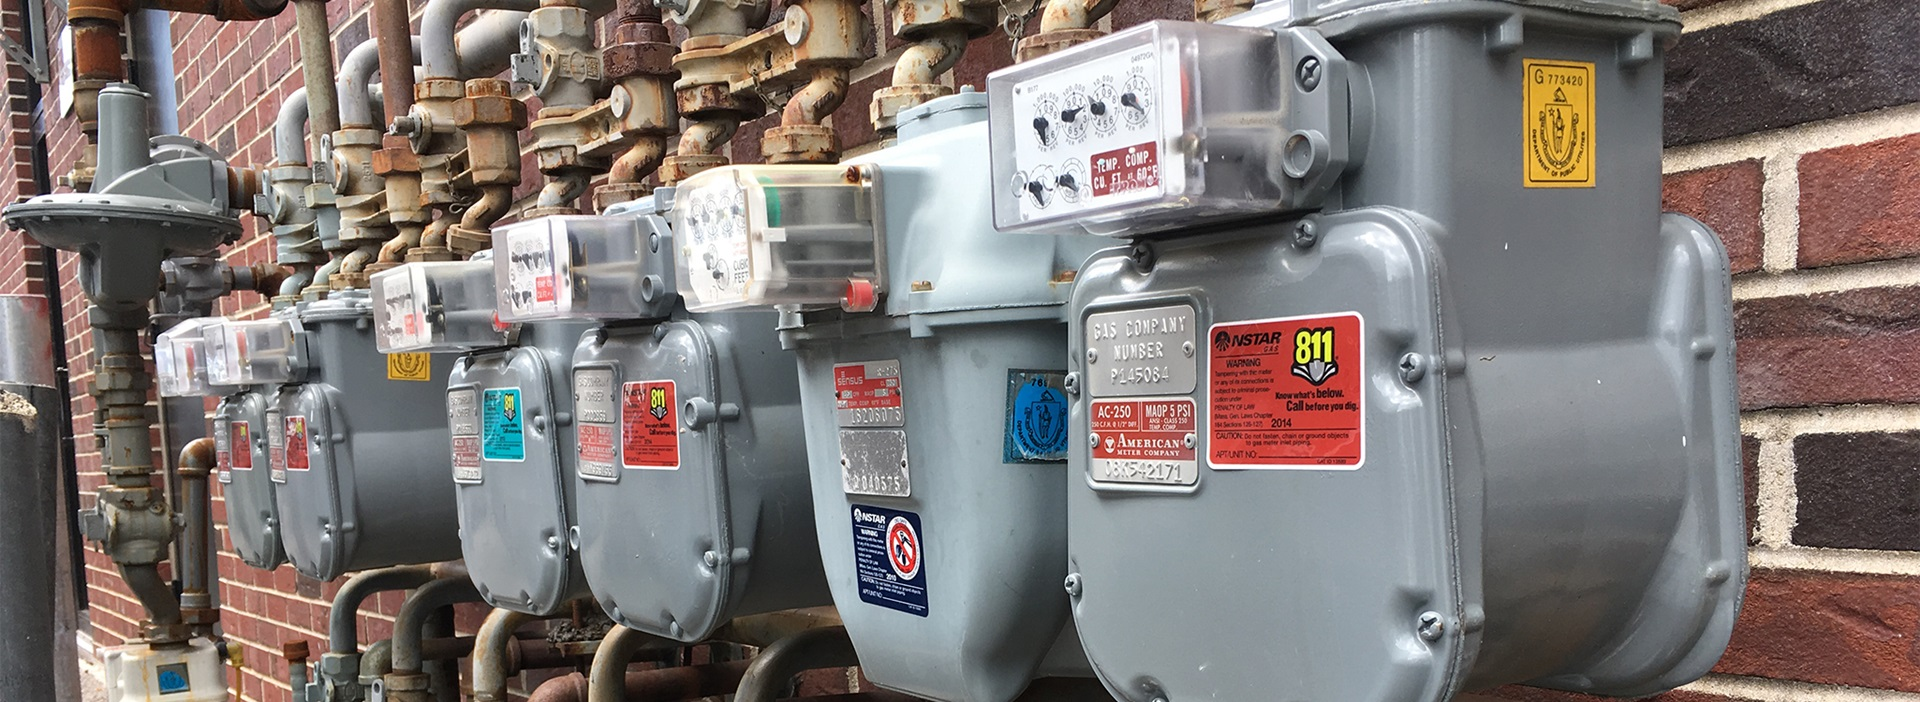 gas lpg services in jordan , خدمات الفاز المركزي